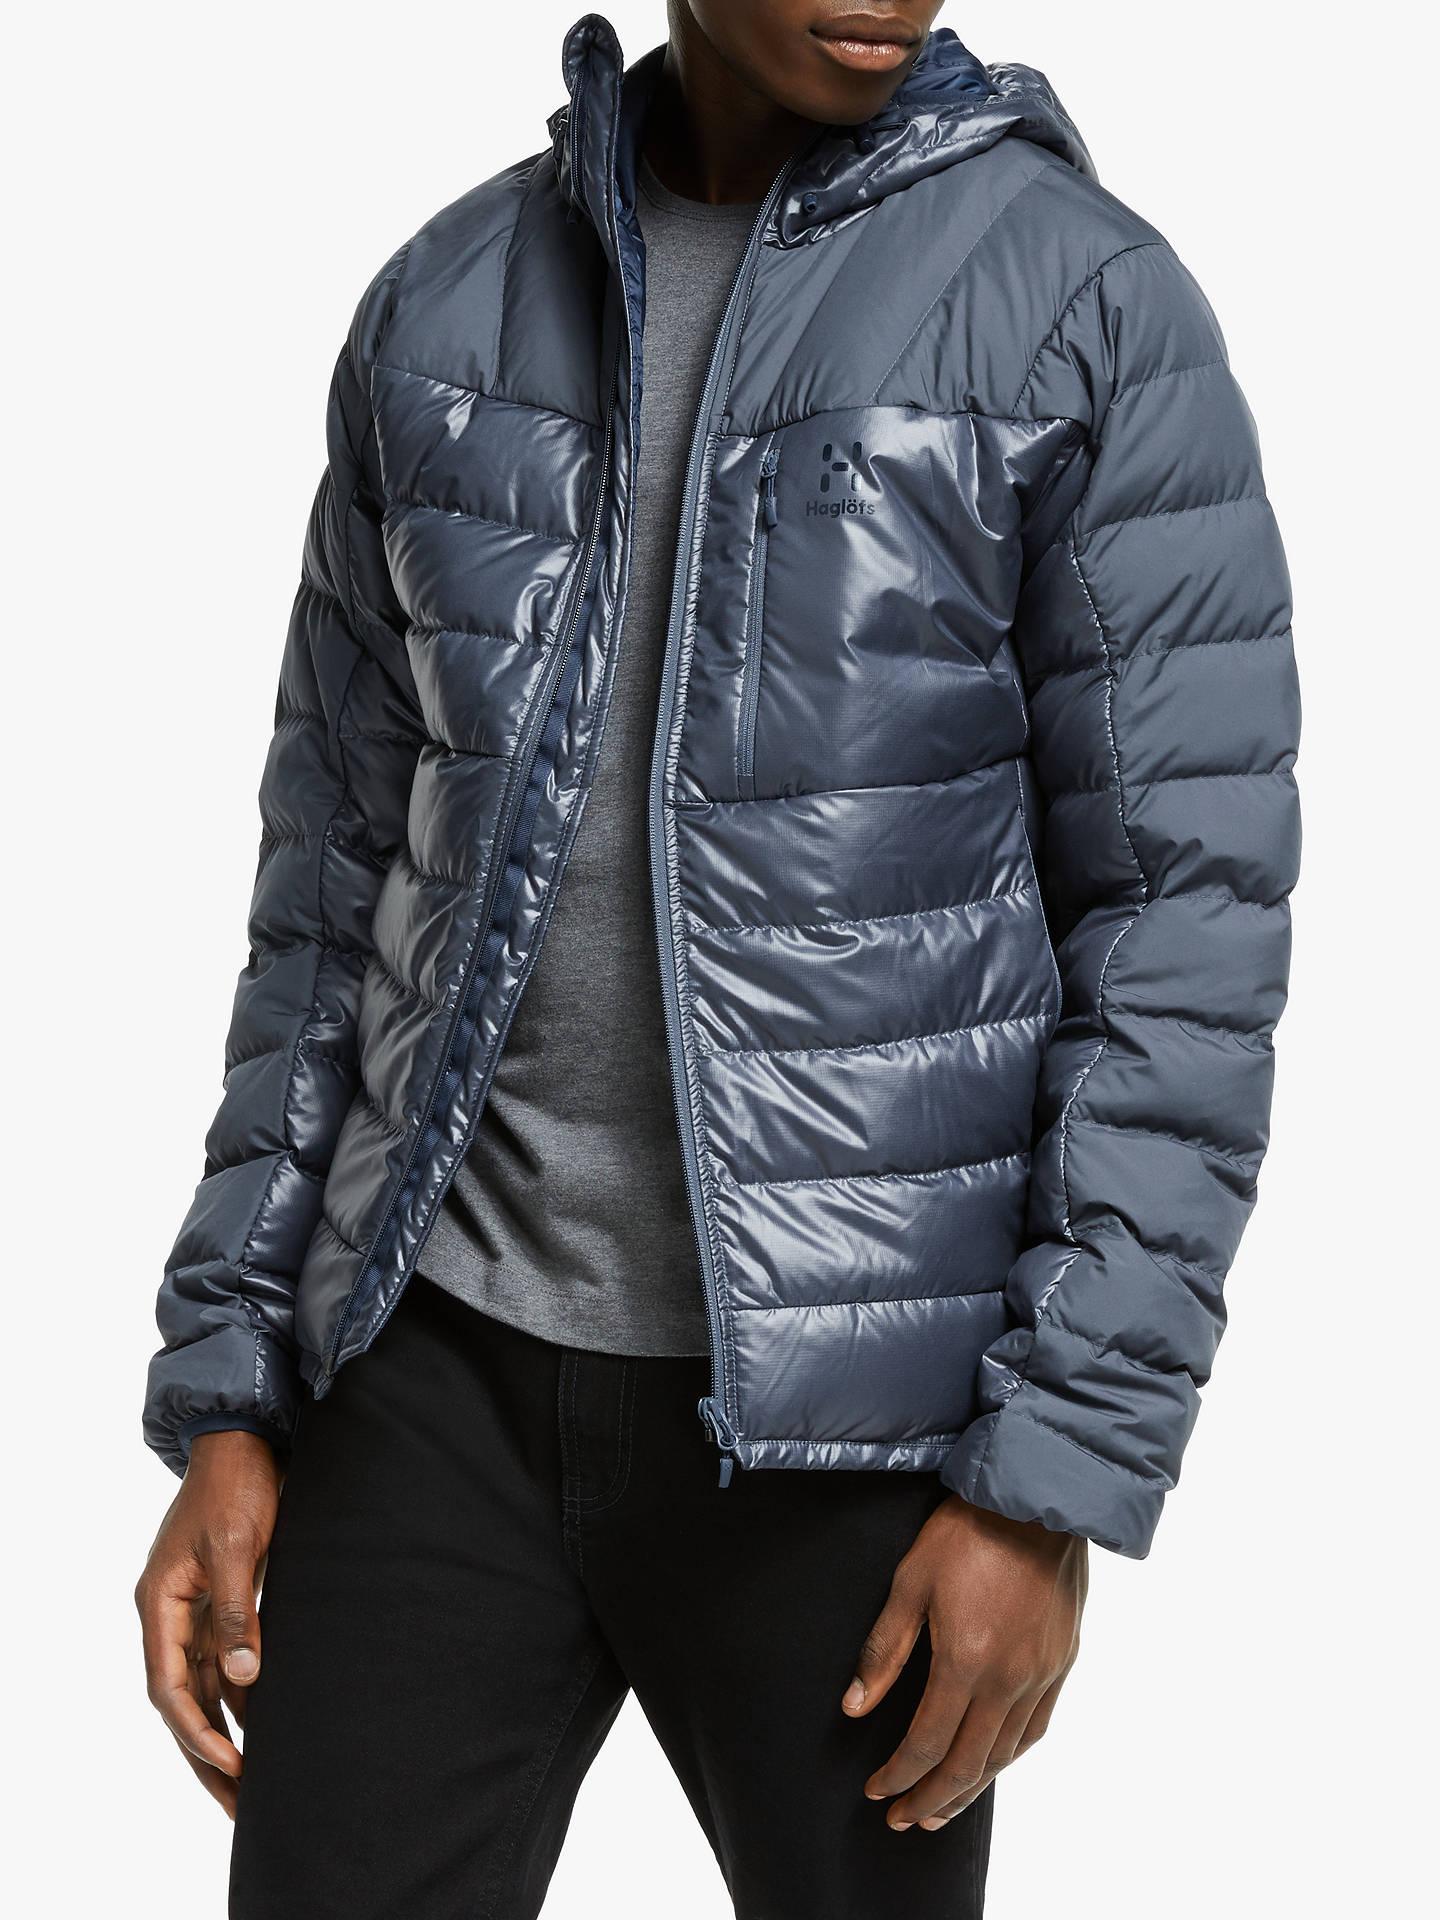 Haglofs Bivvy Down Men S Insulated Jacket At John Lewis Partners